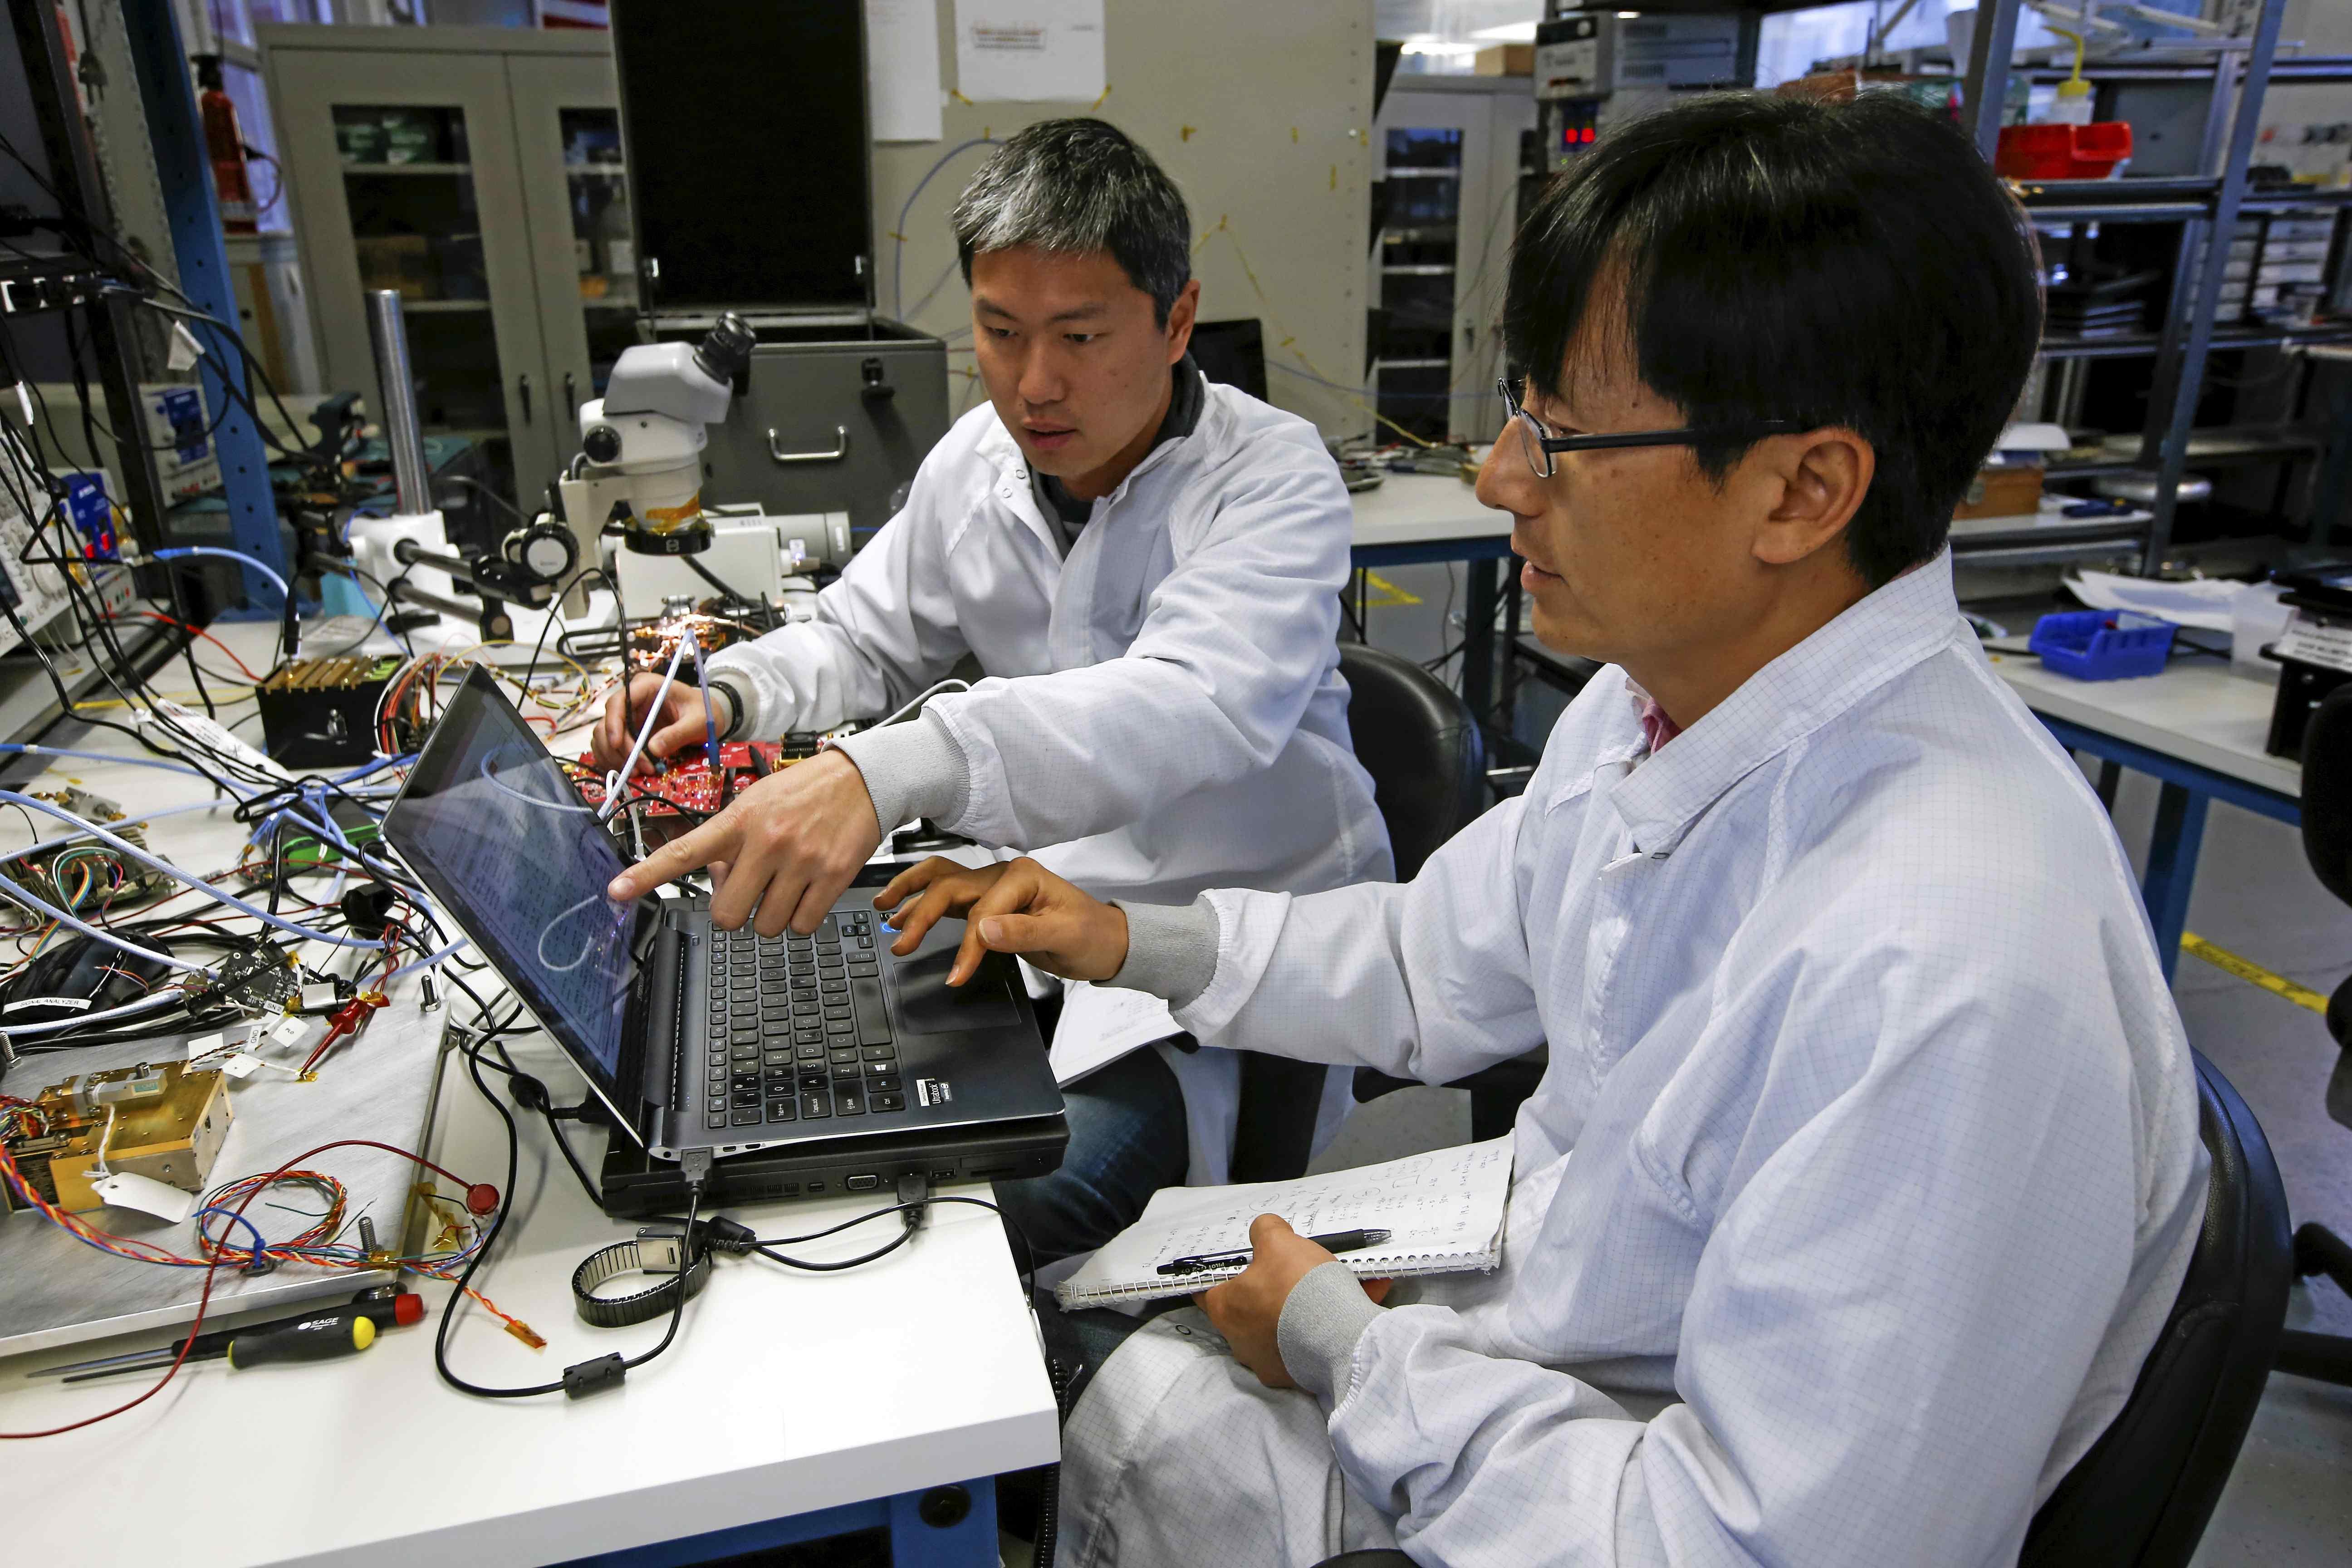 Silicon Valley's zero-gravity space startup boom